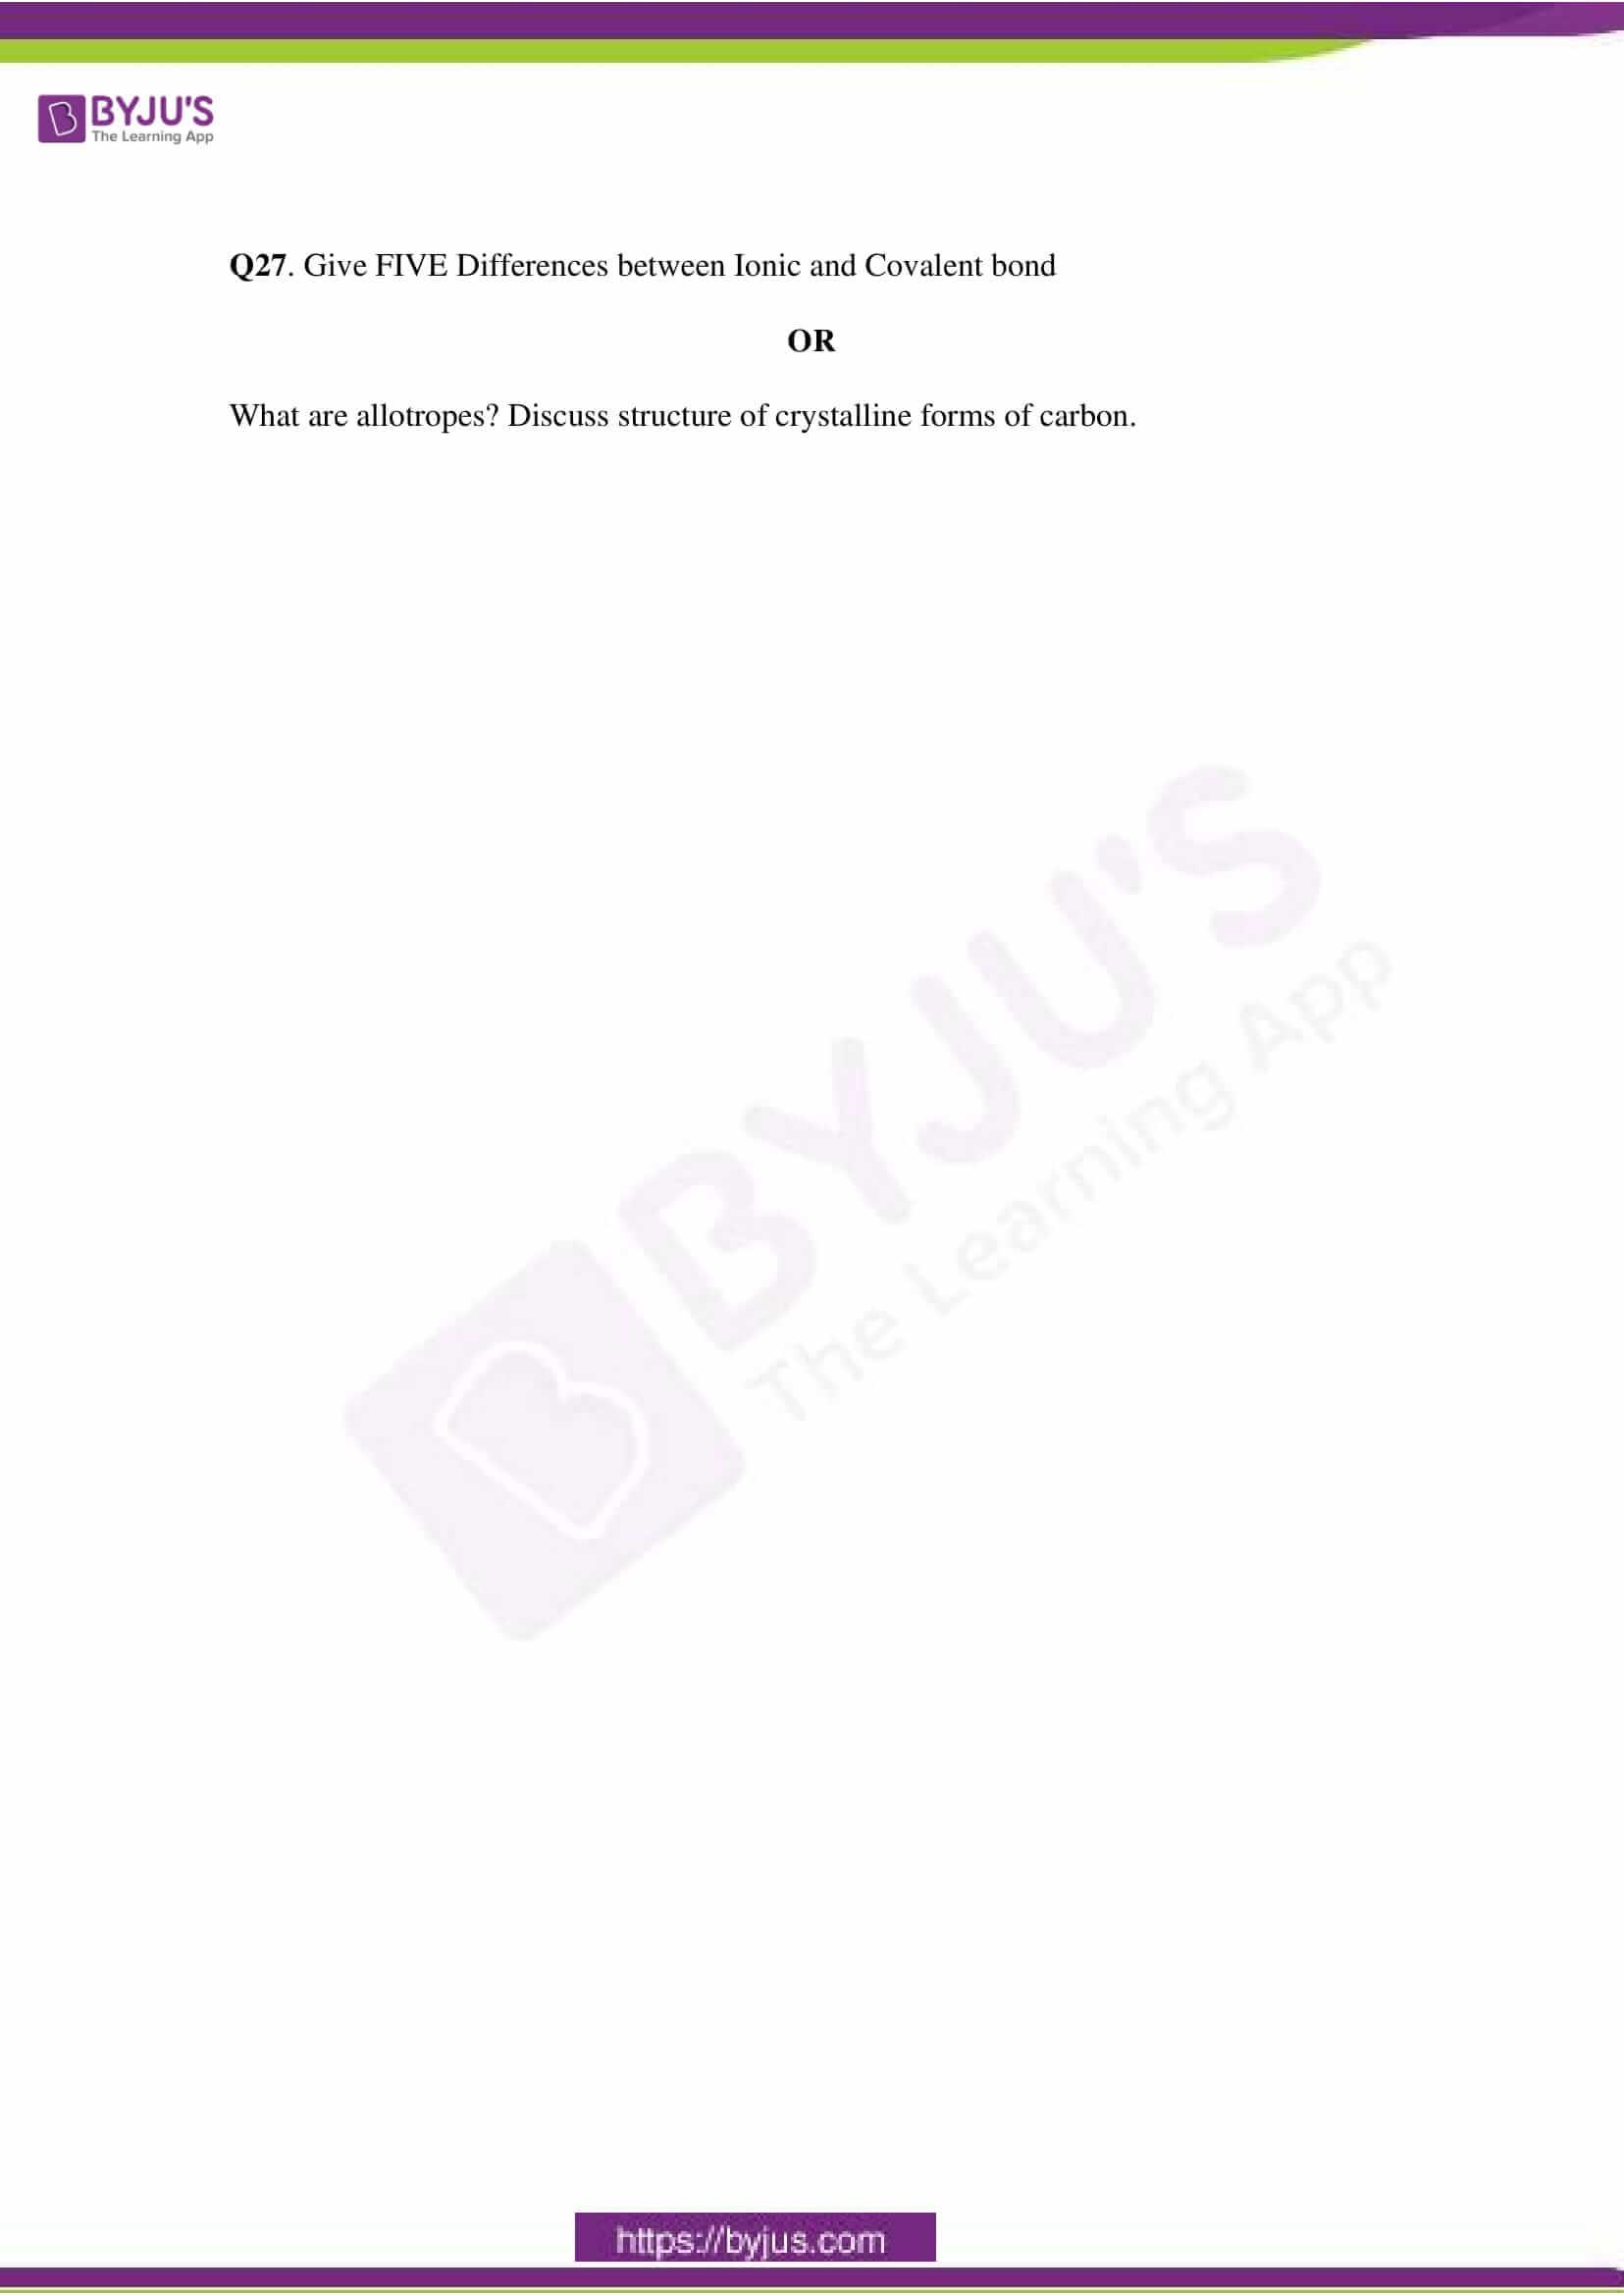 cbse class 11 che sample paper set 1